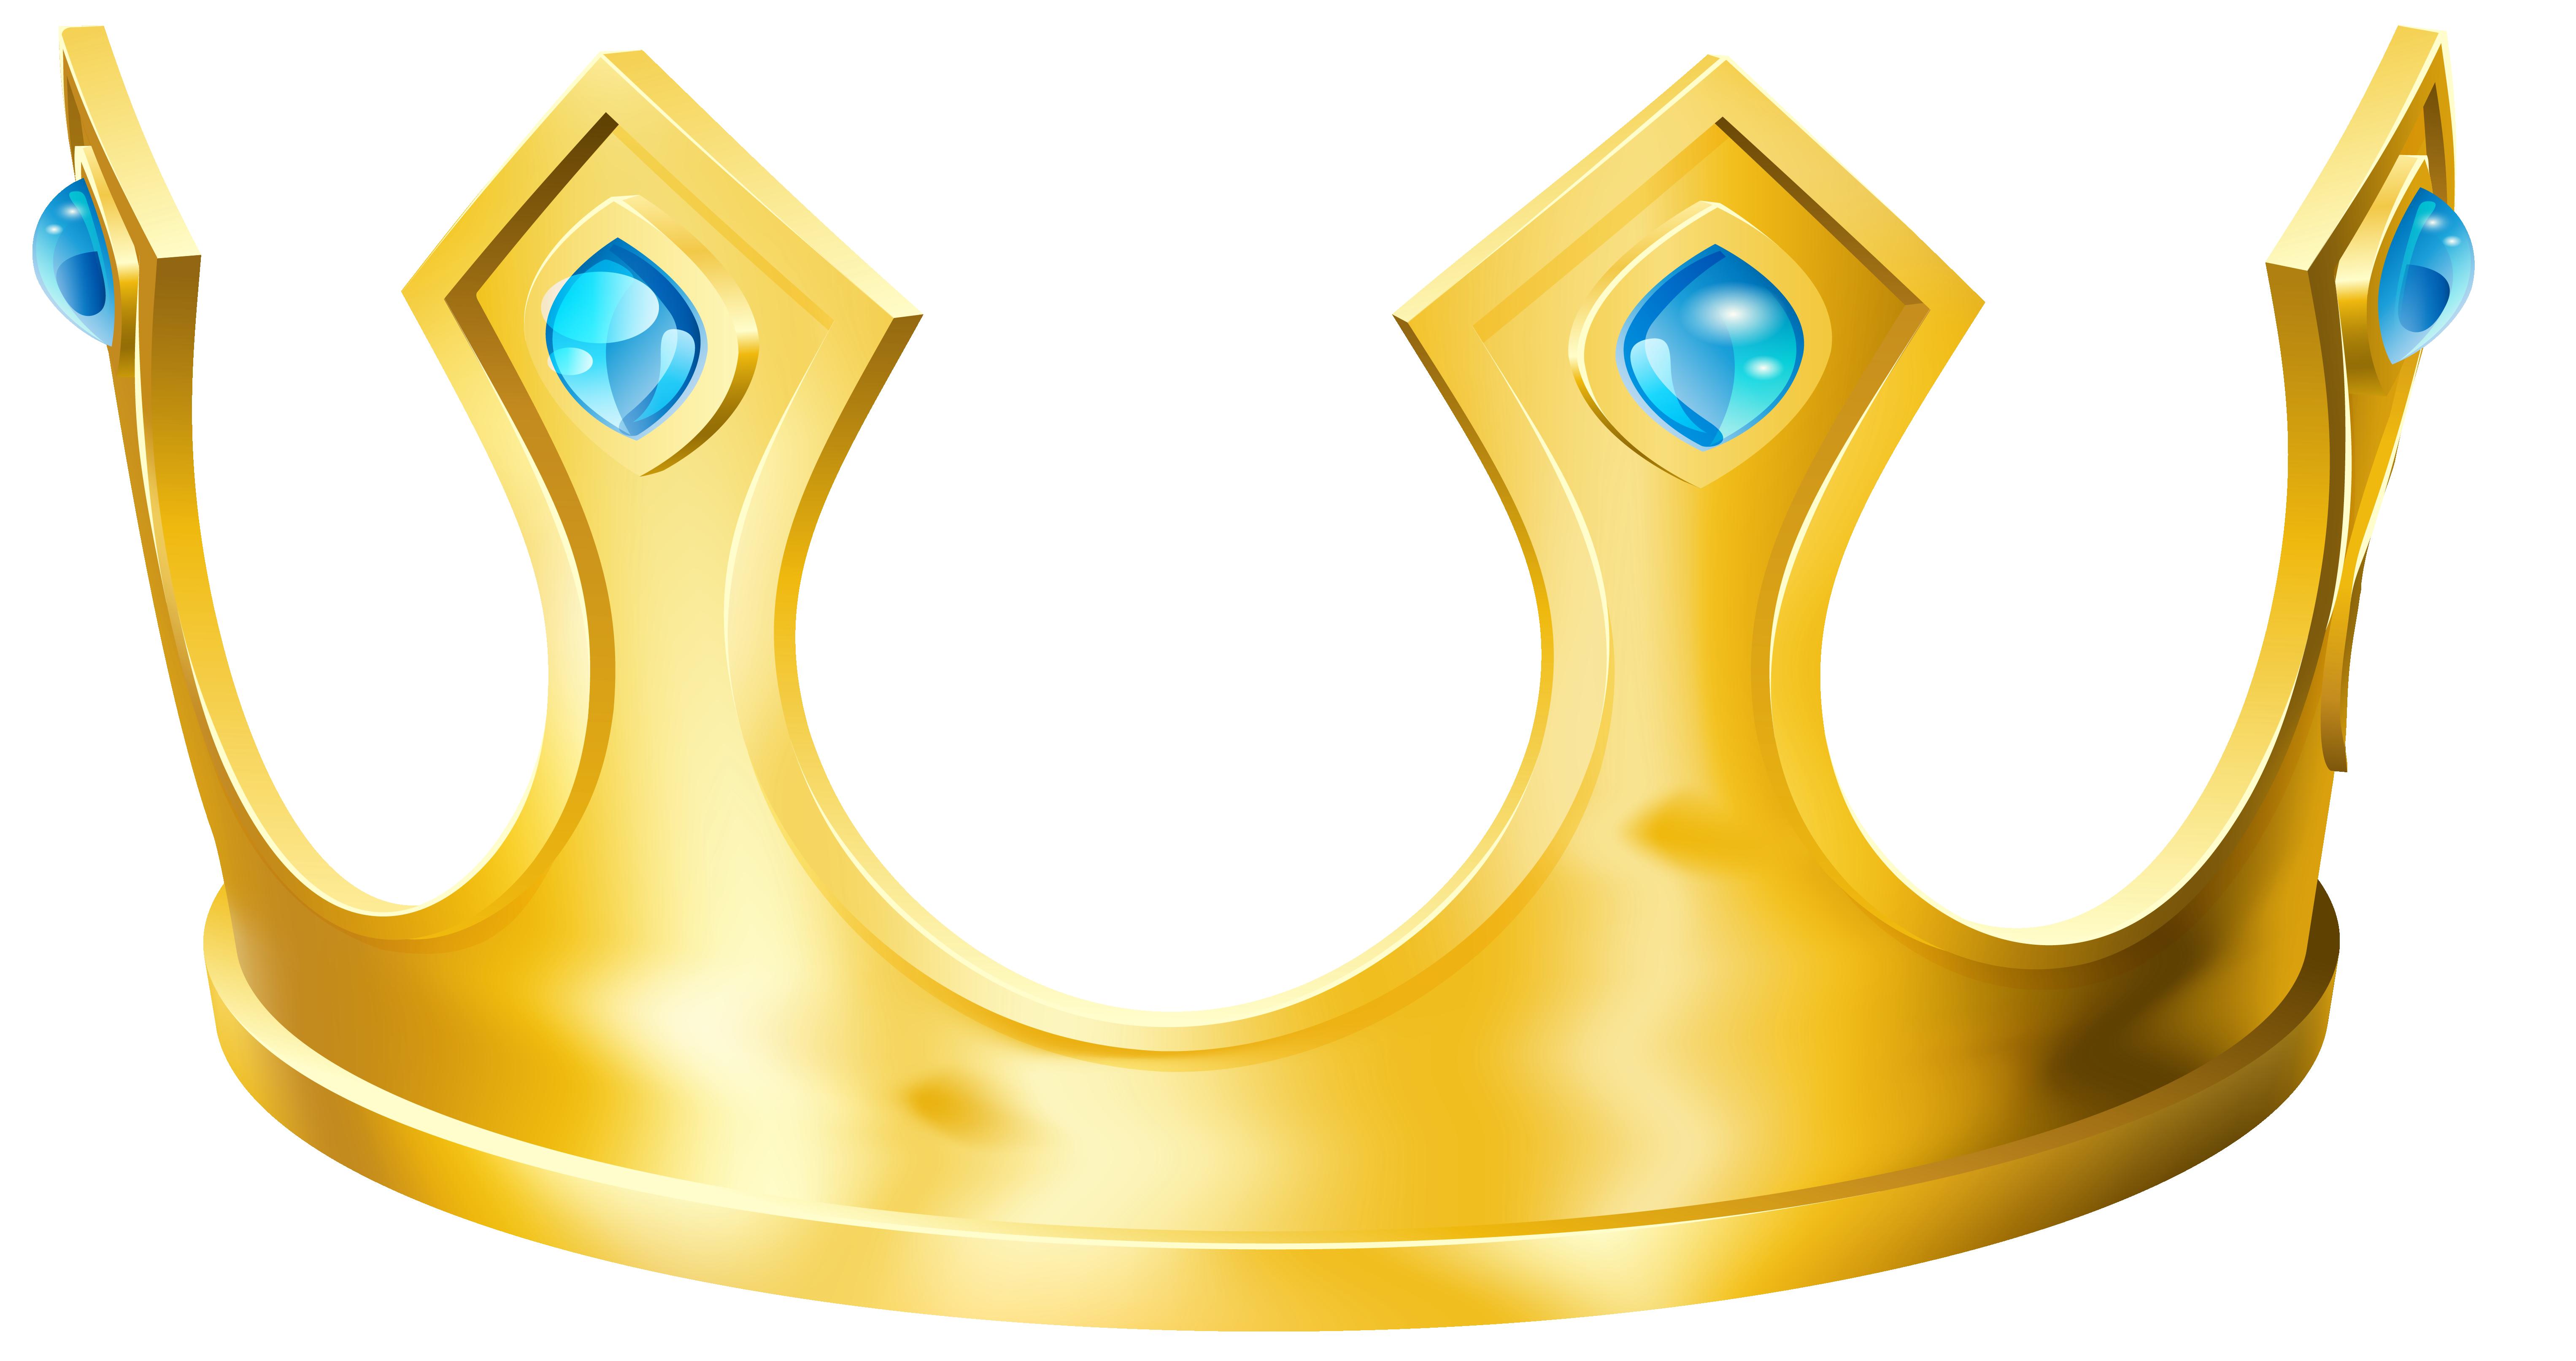 svg Crown png imag gallery. Golden clipart transparent